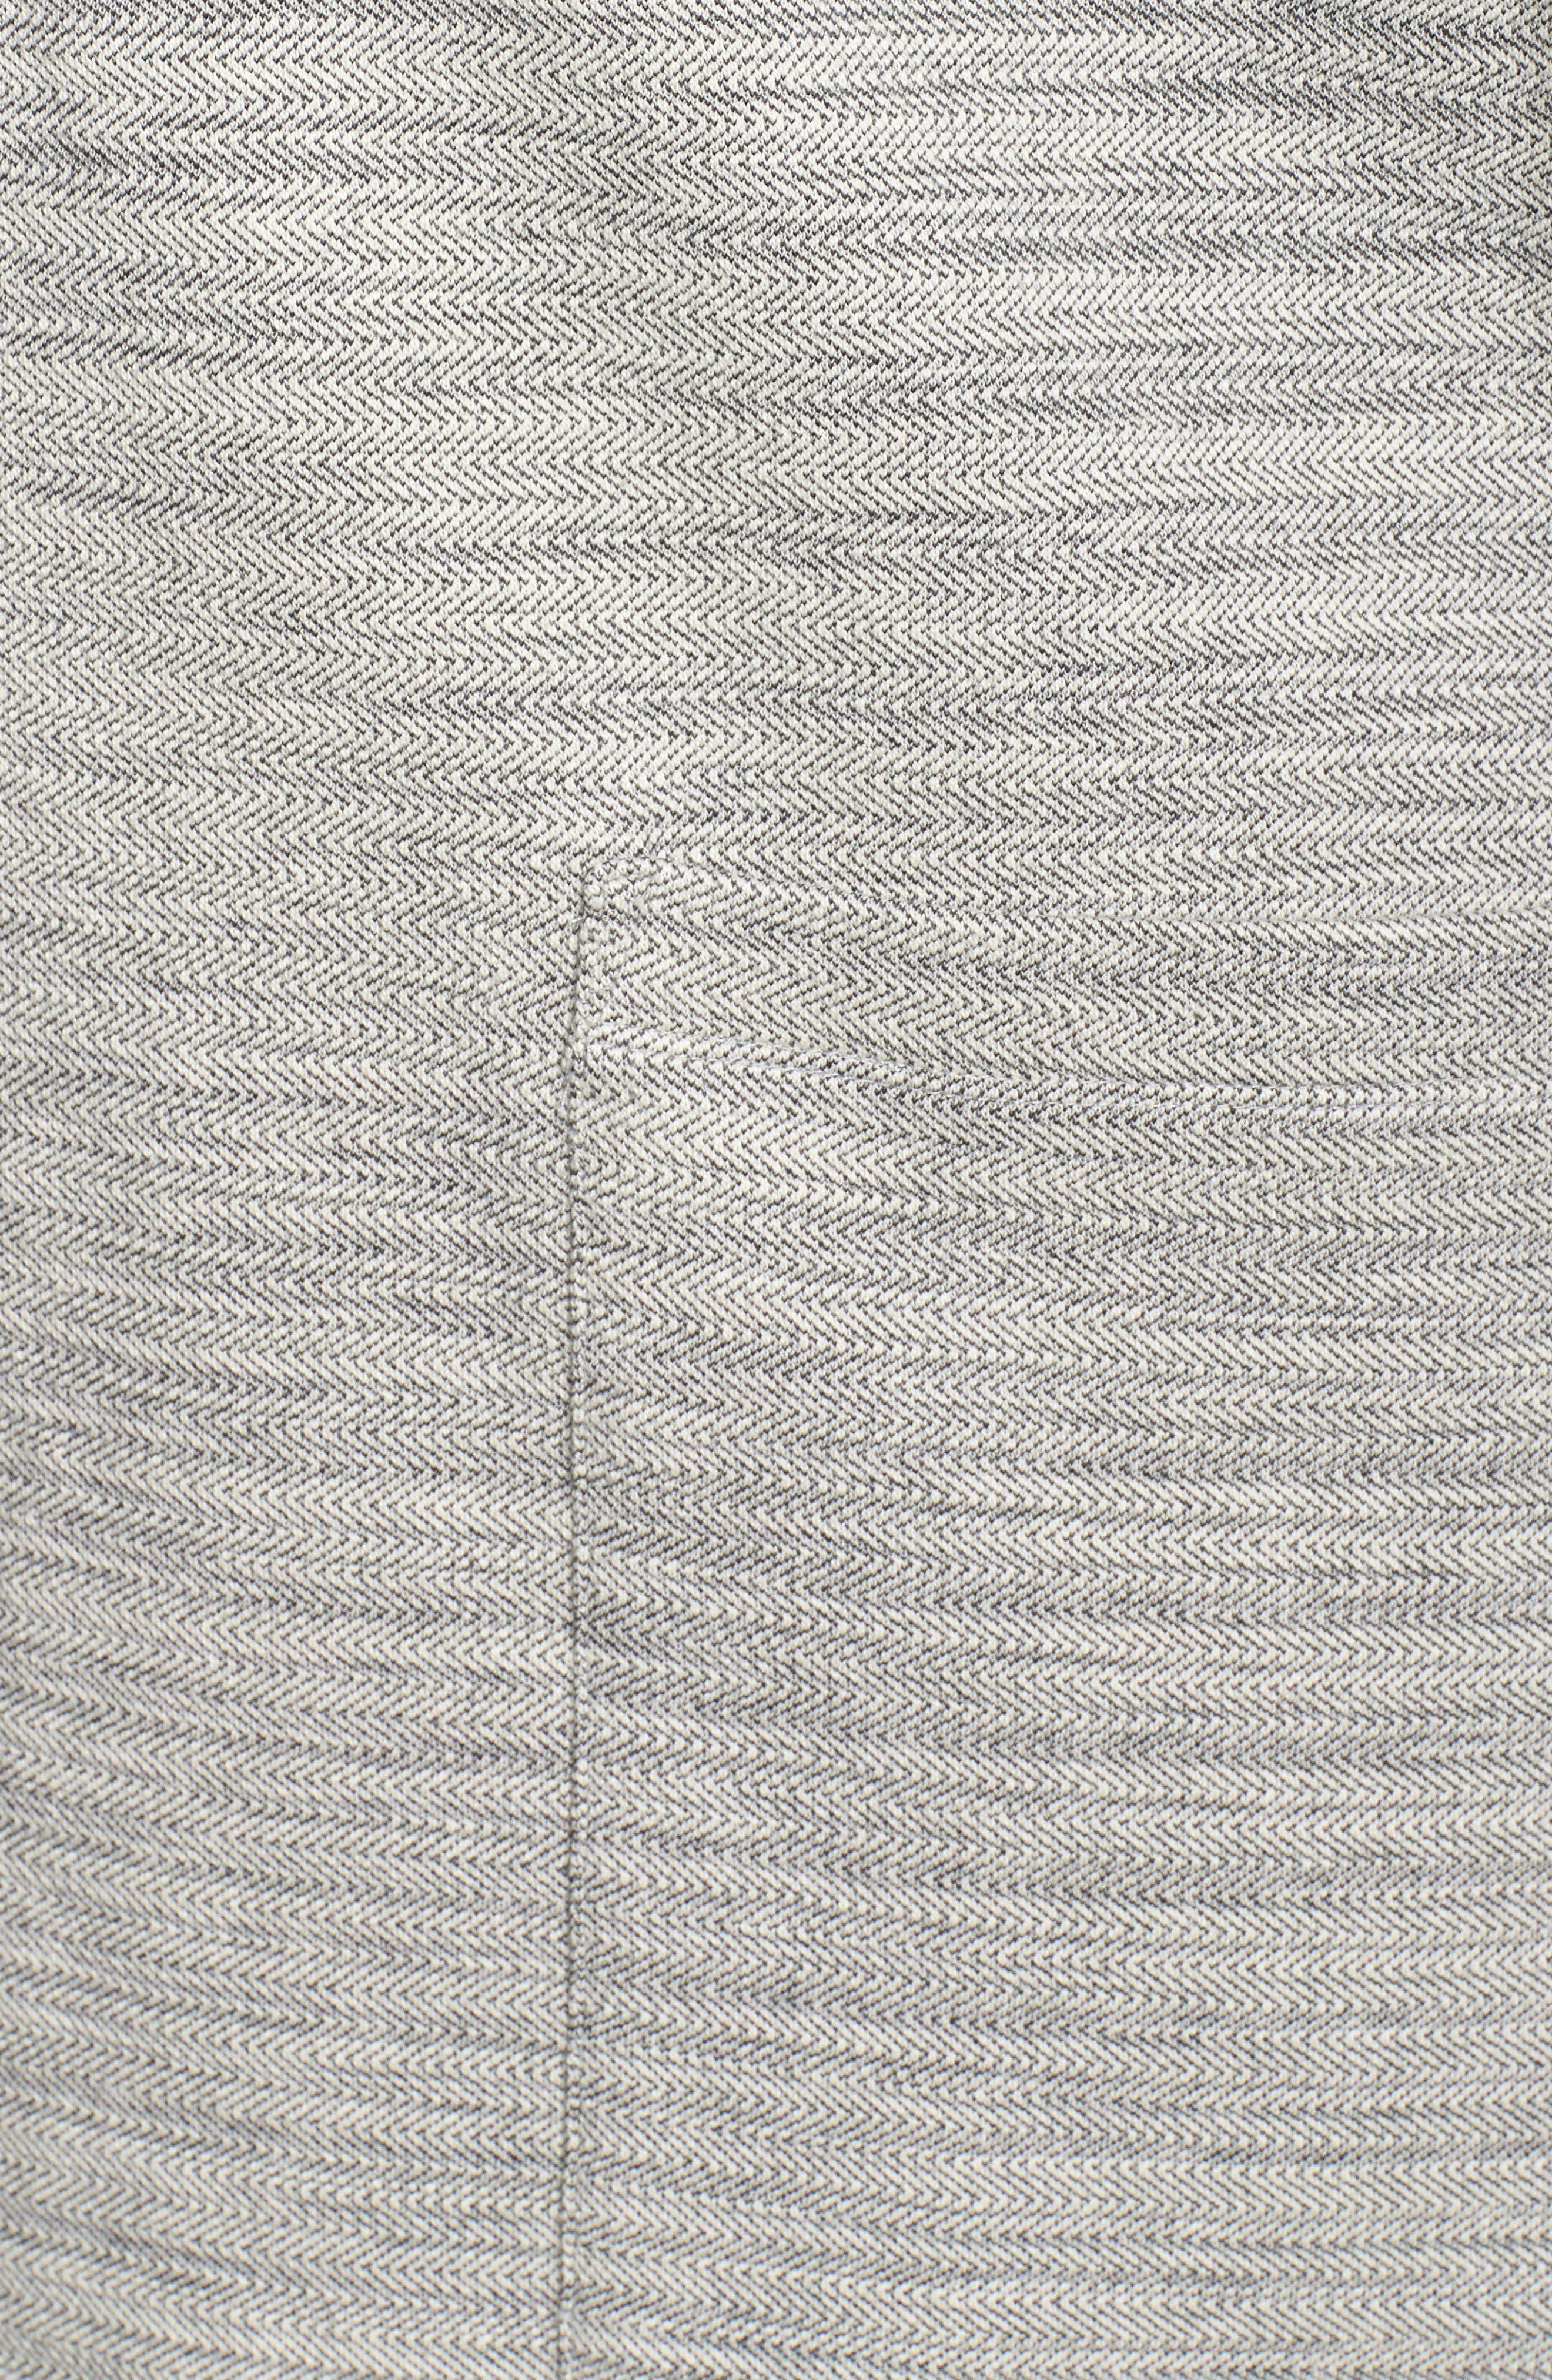 Cotton Blend Tweed Jacket,                             Alternate thumbnail 6, color,                             022